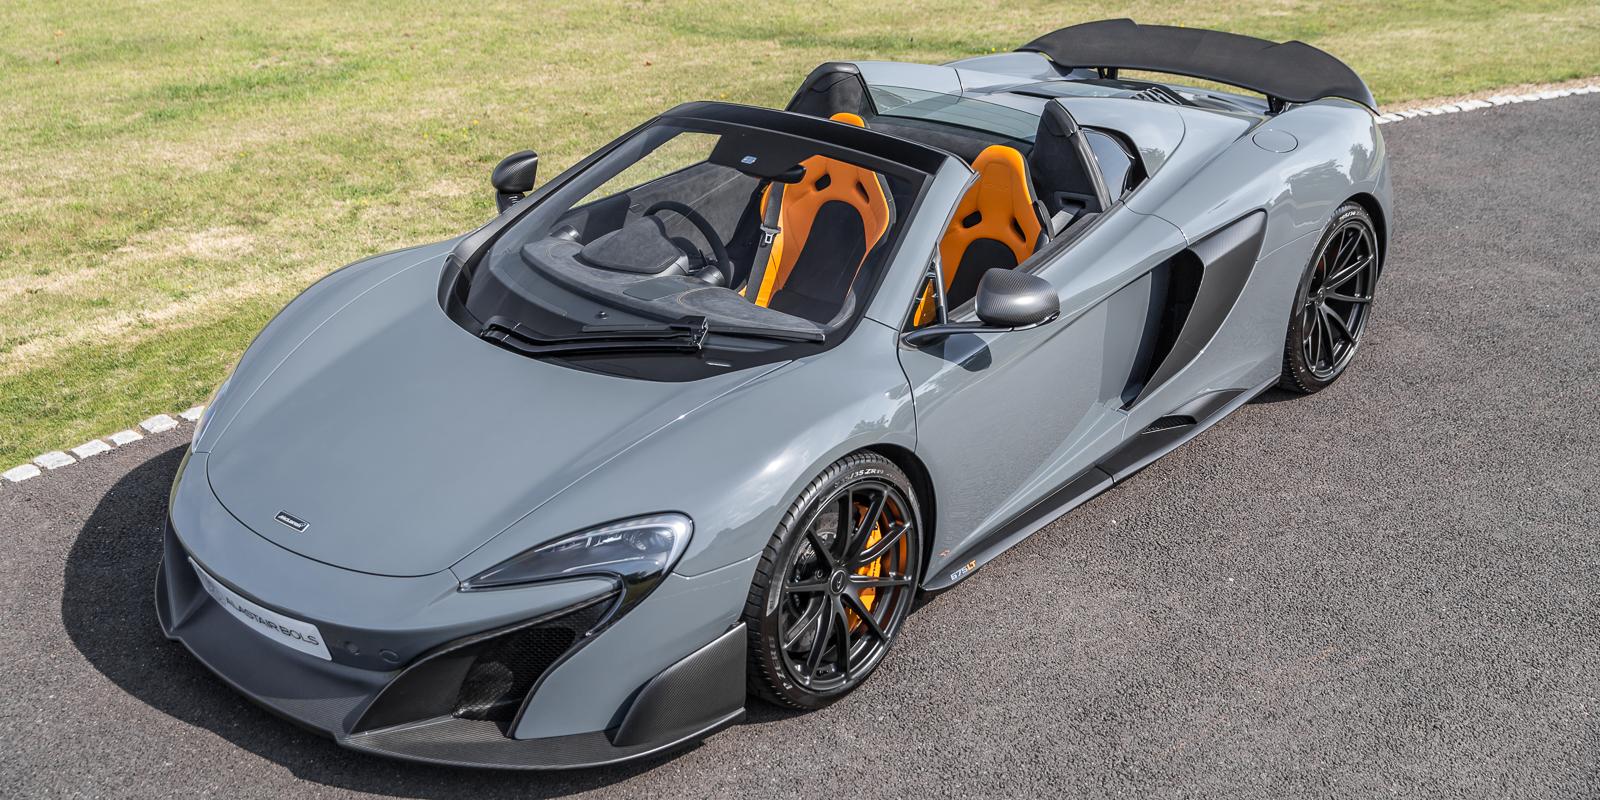 McLaren 675LT Spider in Chicane Grey